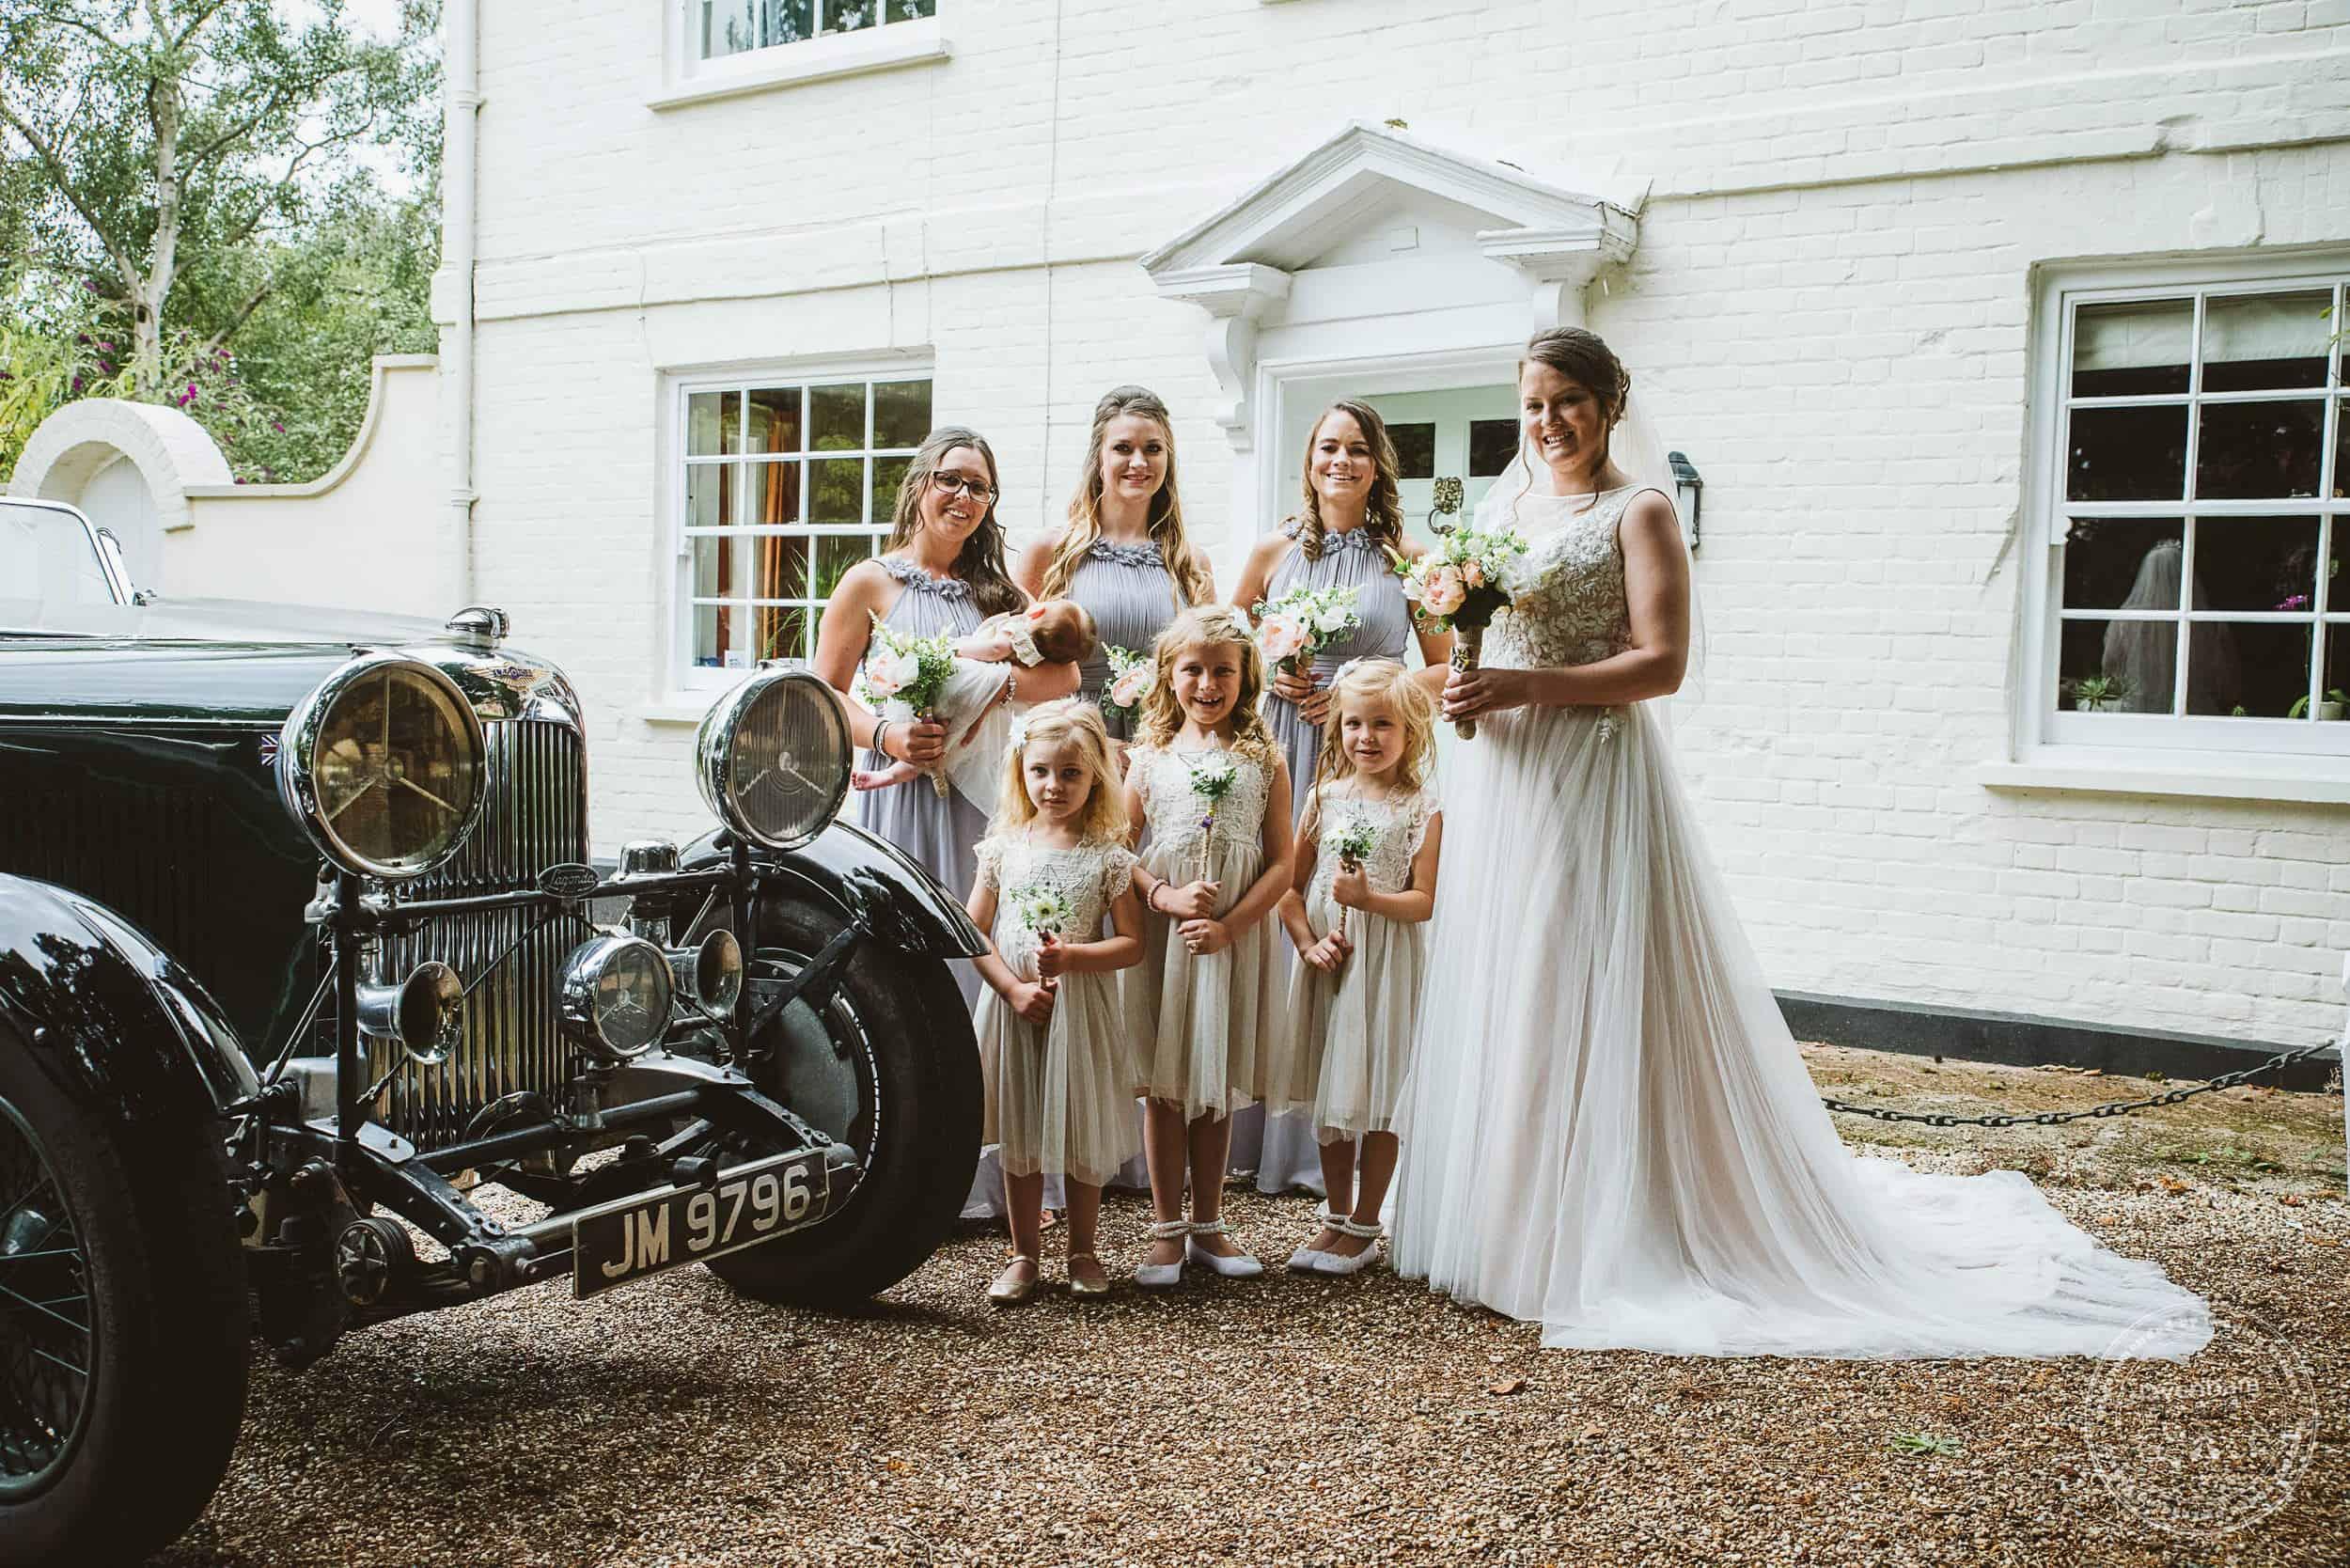 180818 Marks Hall Wedding Photography Lavenham Photographic 037